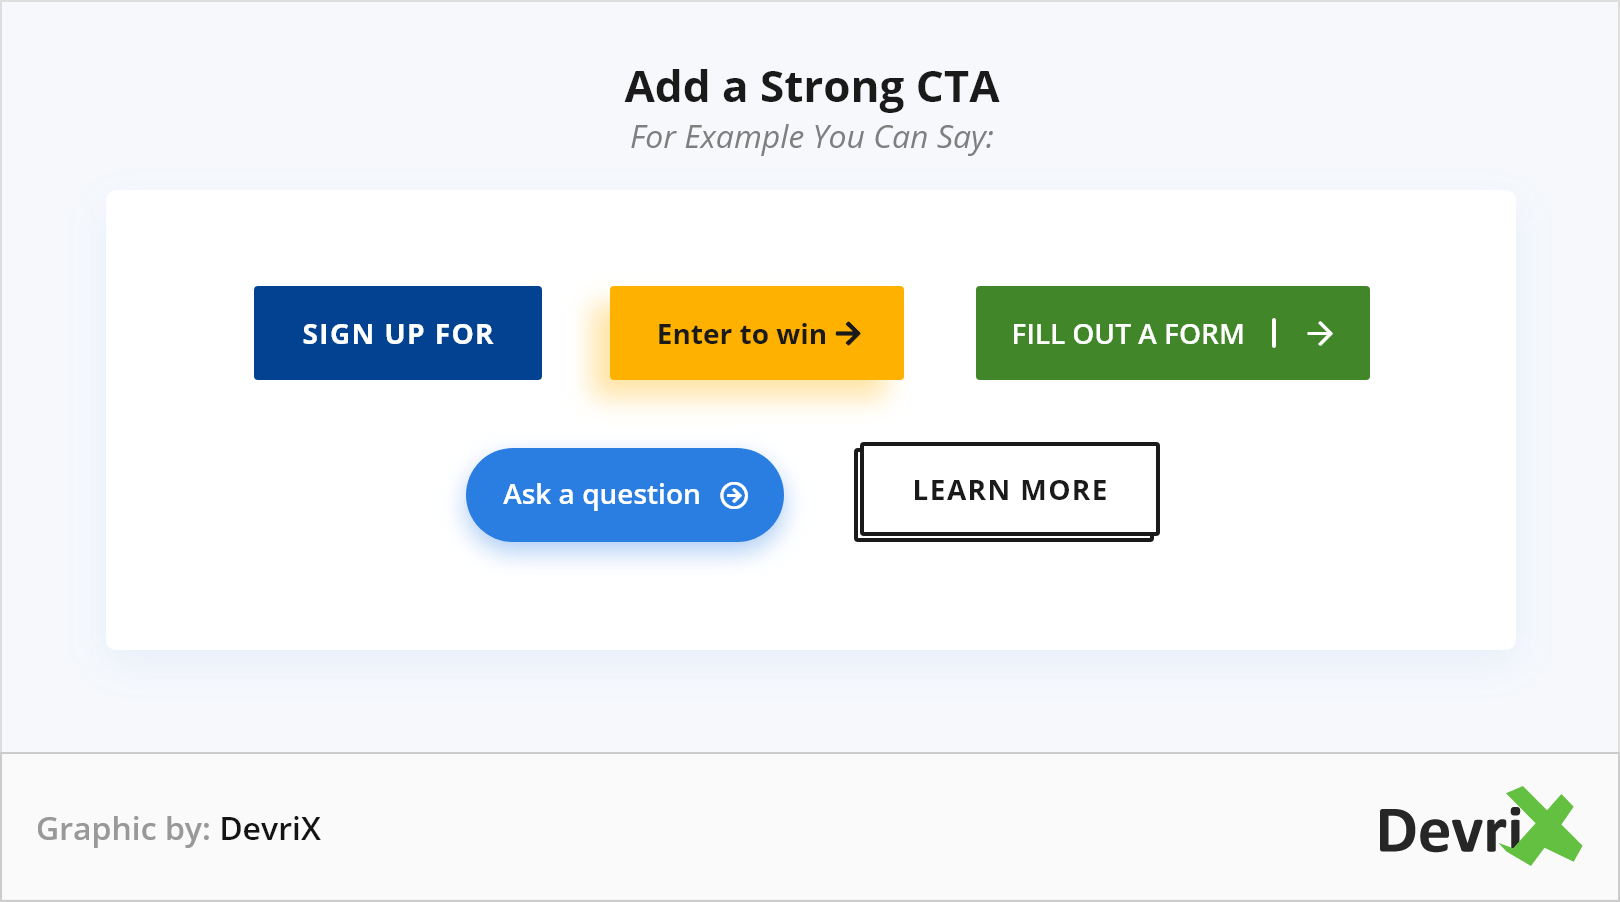 Add a Strong CTA